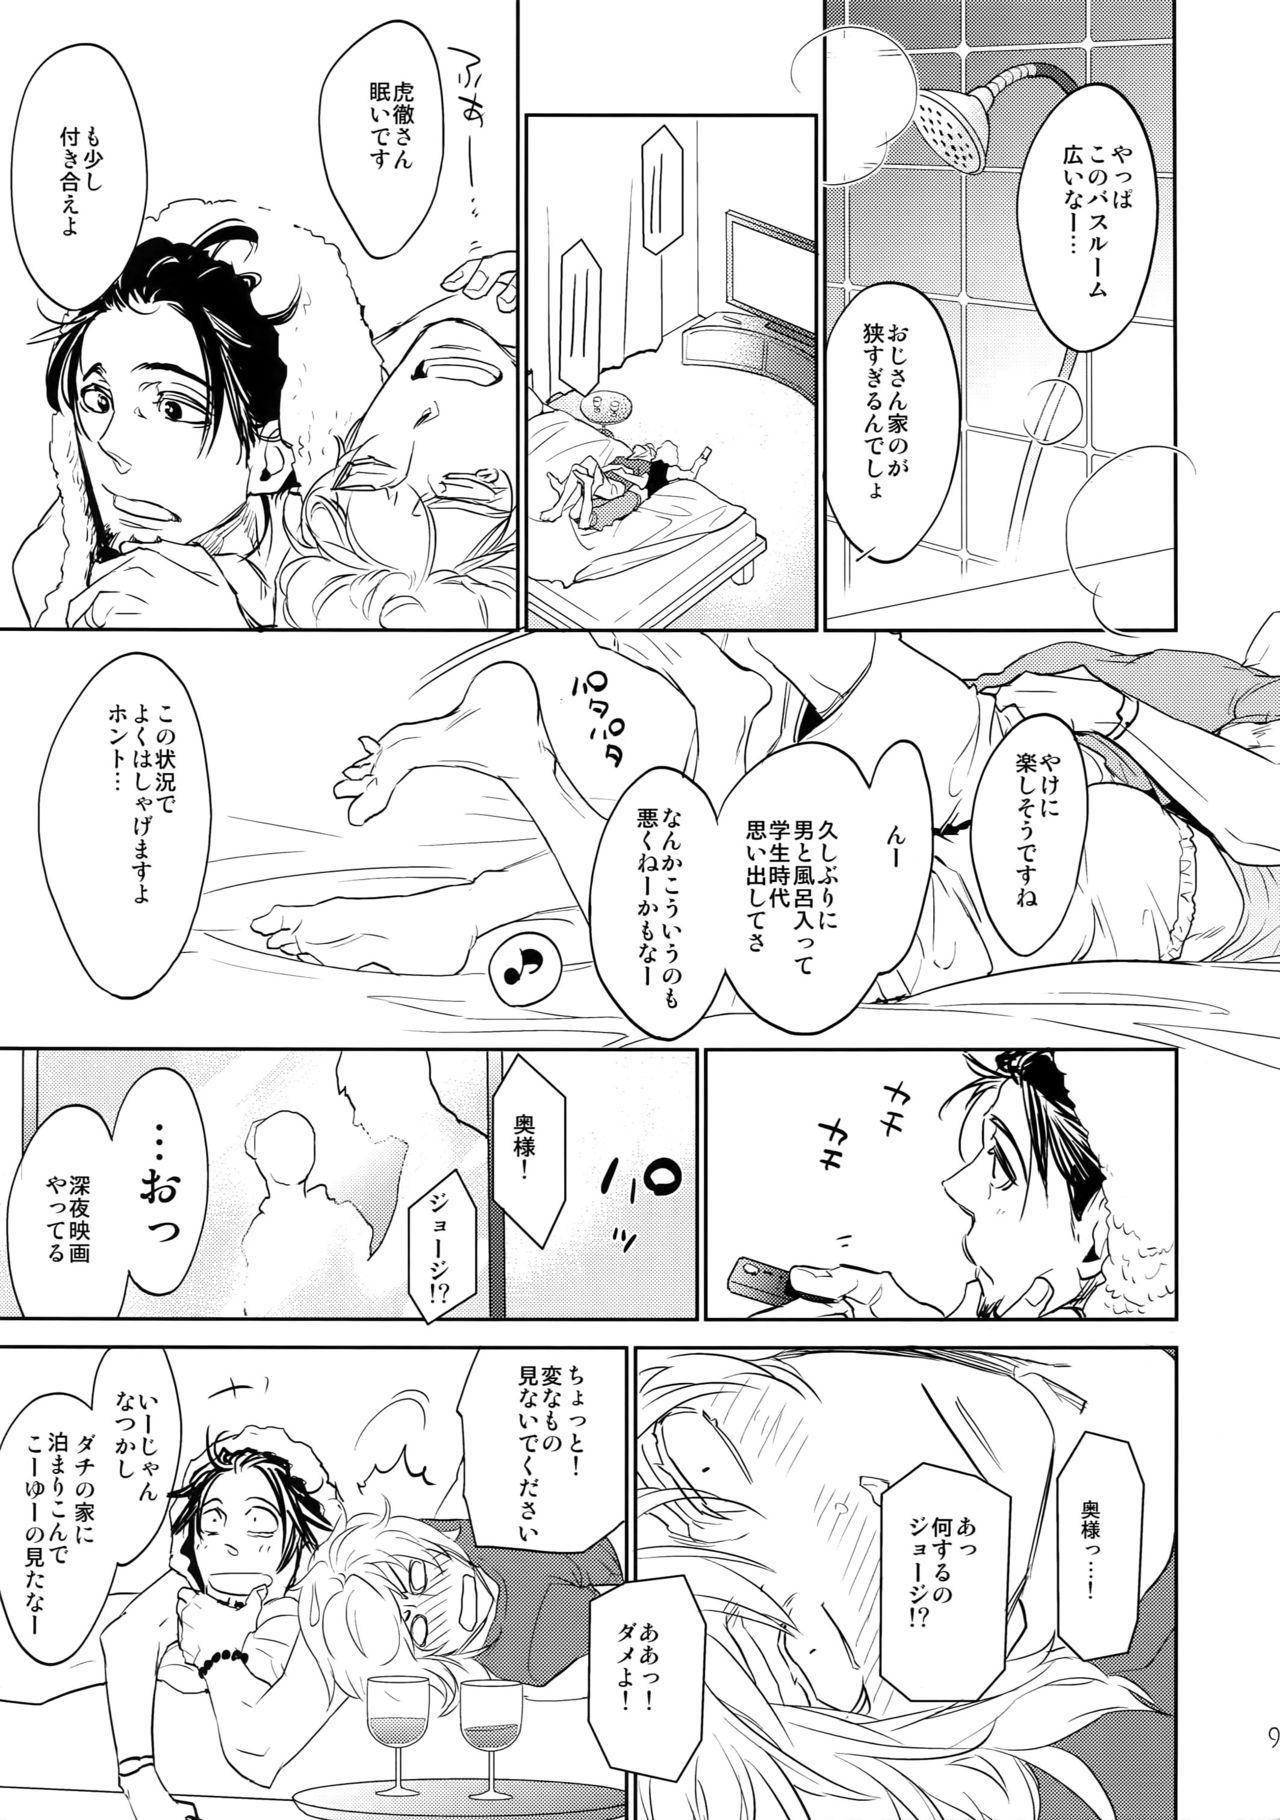 T&B Sairoku! 2 7